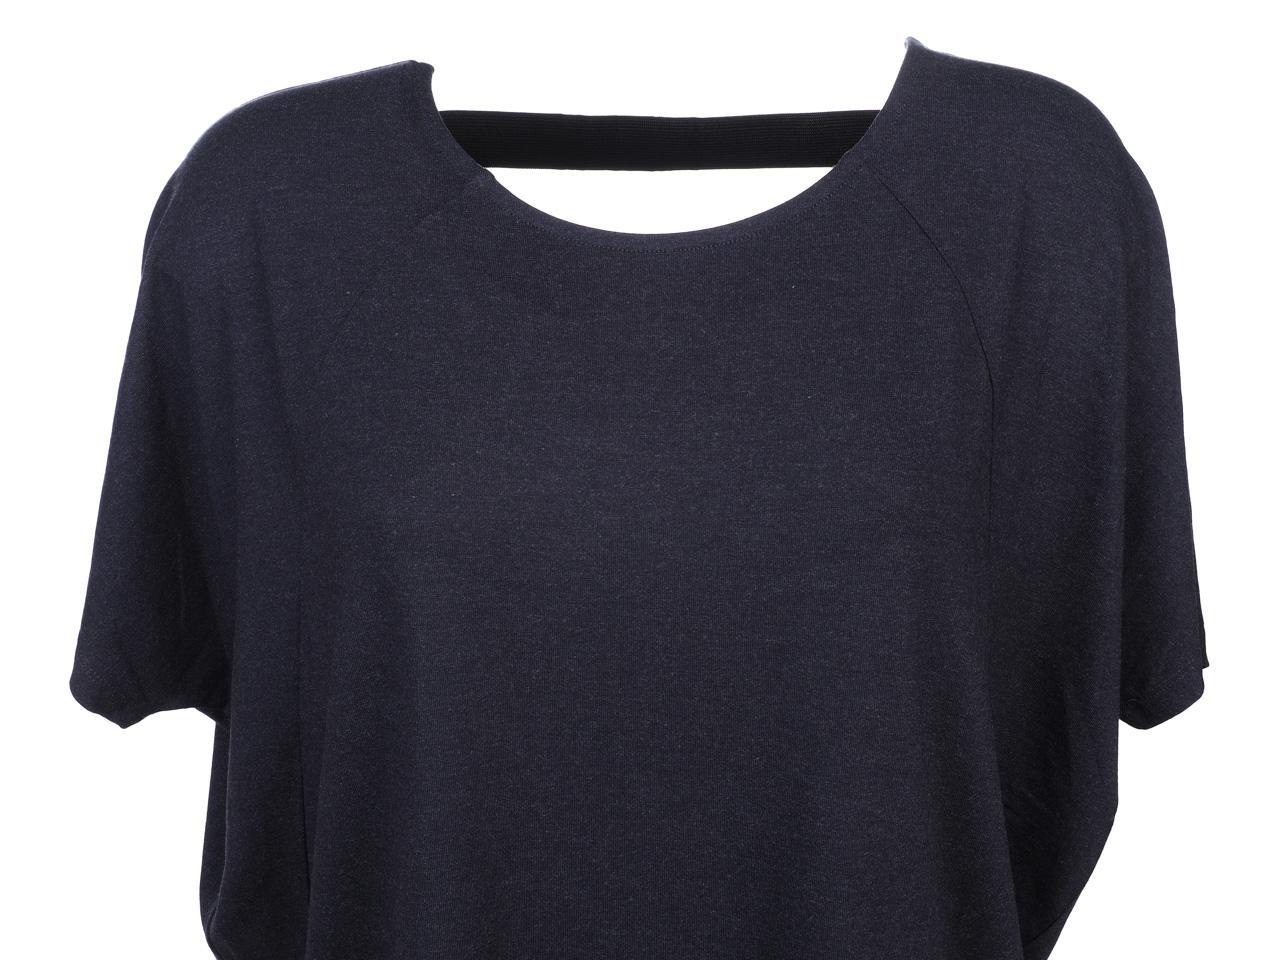 Tee-shirt-manches-courtes-Only-Moster-strap-nv-mc-tee-l-Bleu-43825-Neuf miniature 2